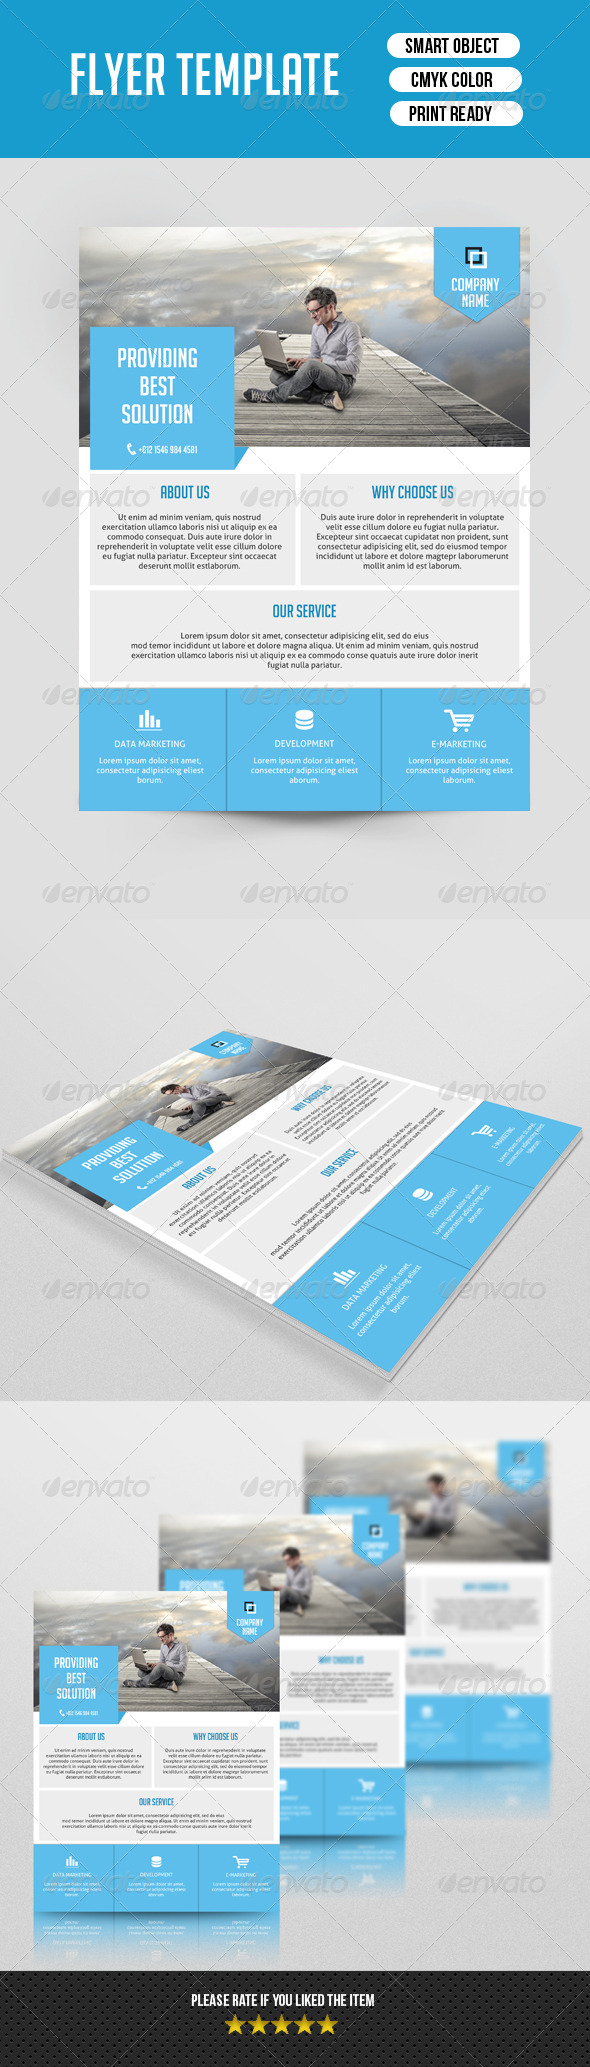 Business Flyer Template-V106